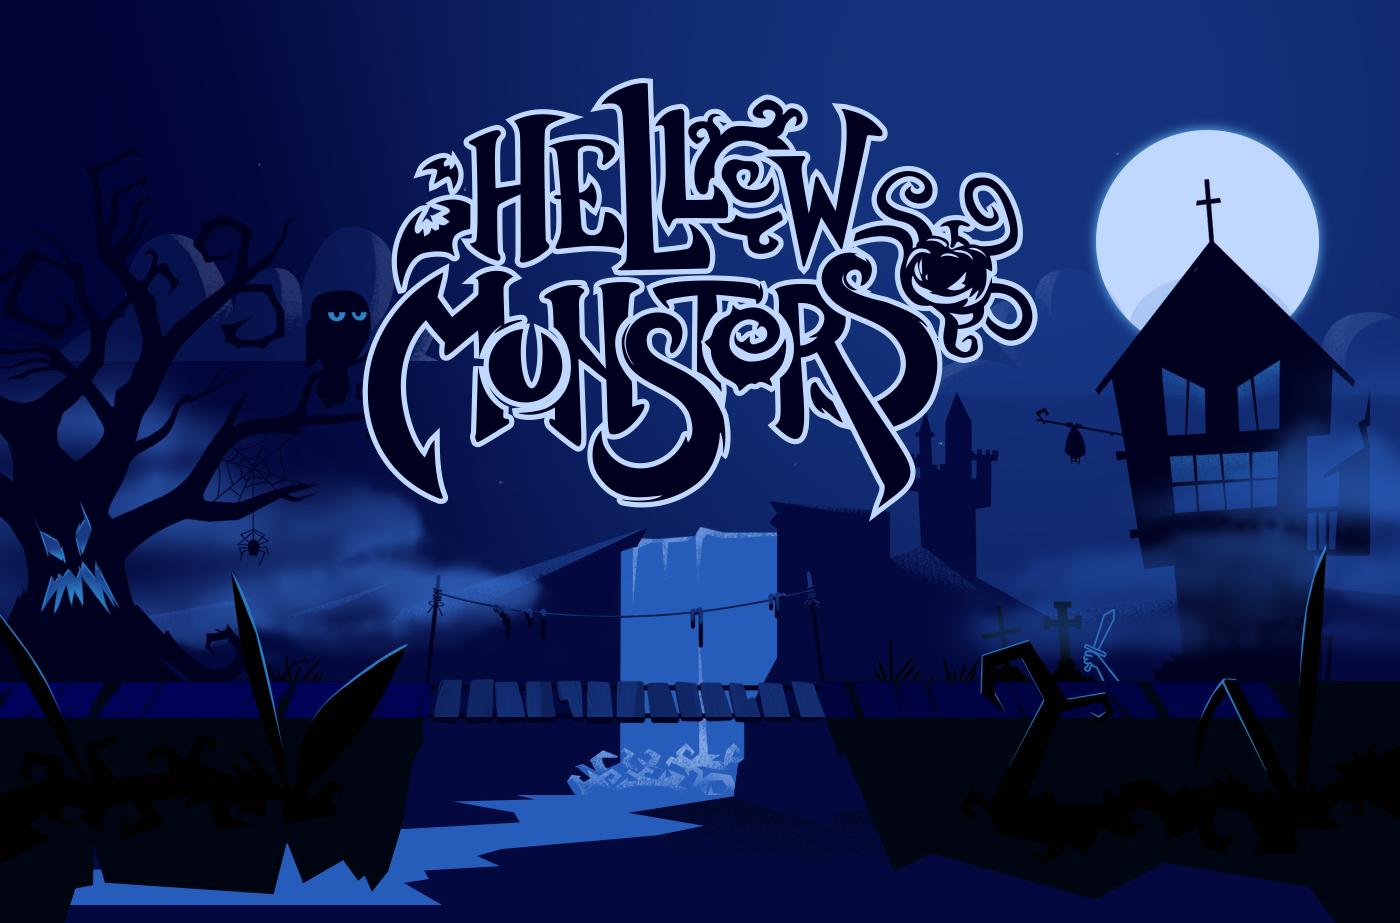 animation  cartoon Character Digital Art  doodle graphic design  Halloween ILLUSTRATION  monster Behance